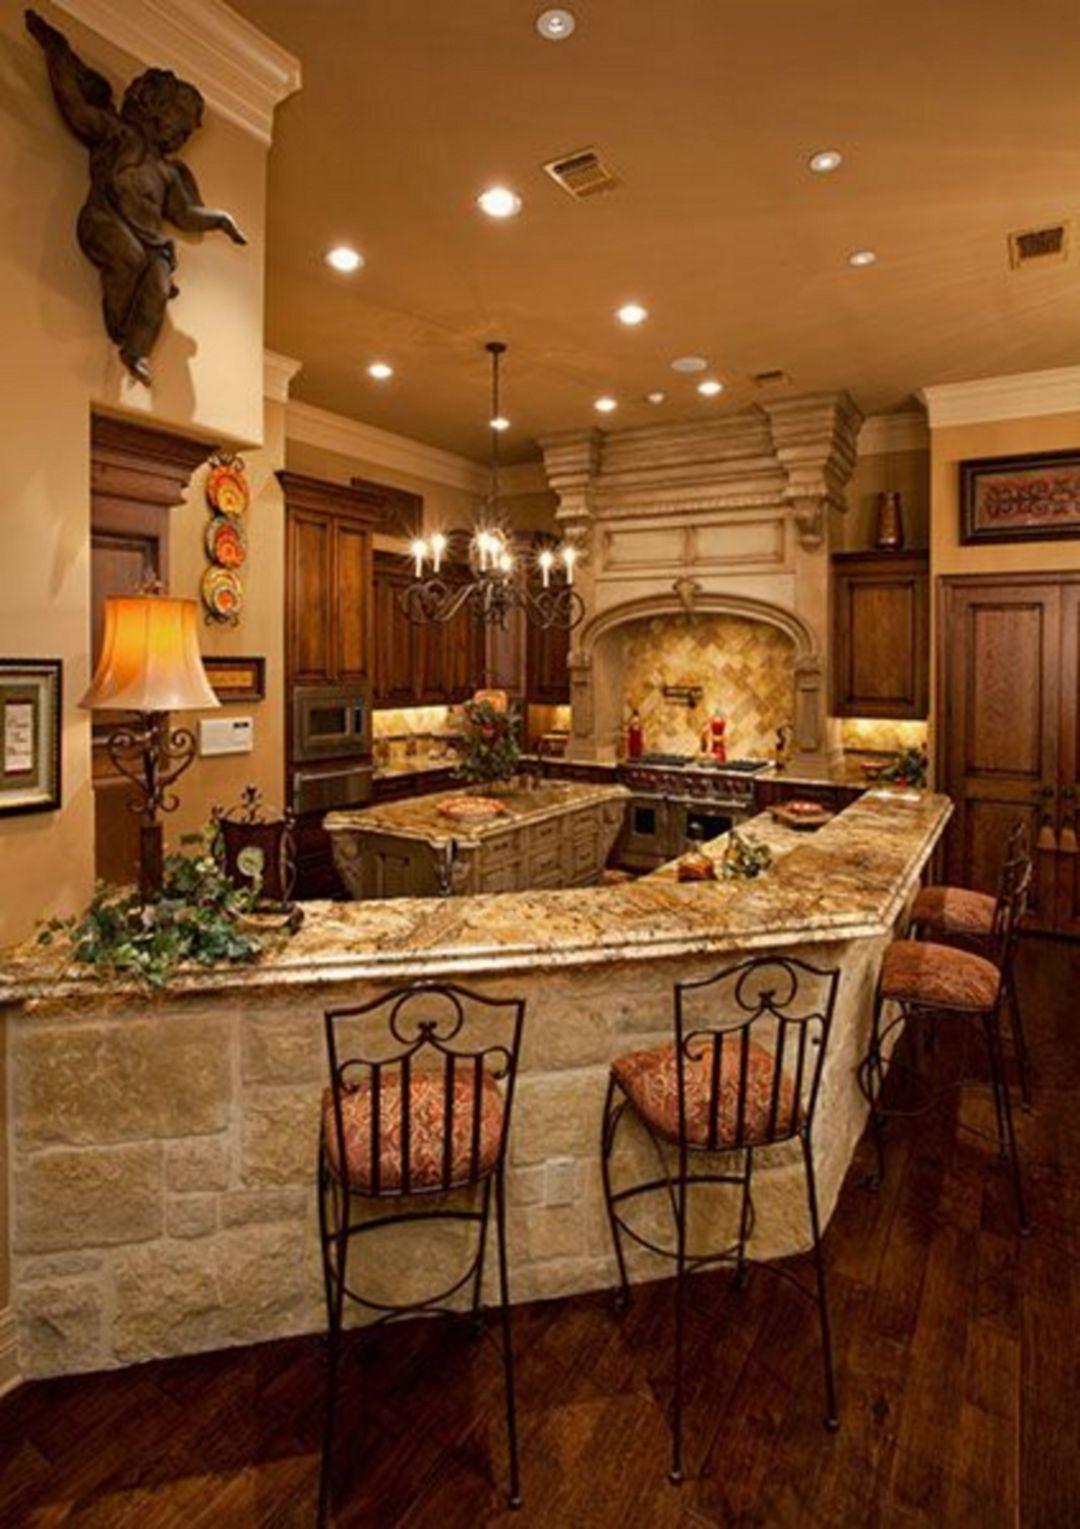 20 Amazing Italian Style Kitchen Decor Ideas For Your Inspiration Tuscan Kitchen Design Italian Kitchen Design Mediterranean Home Decor